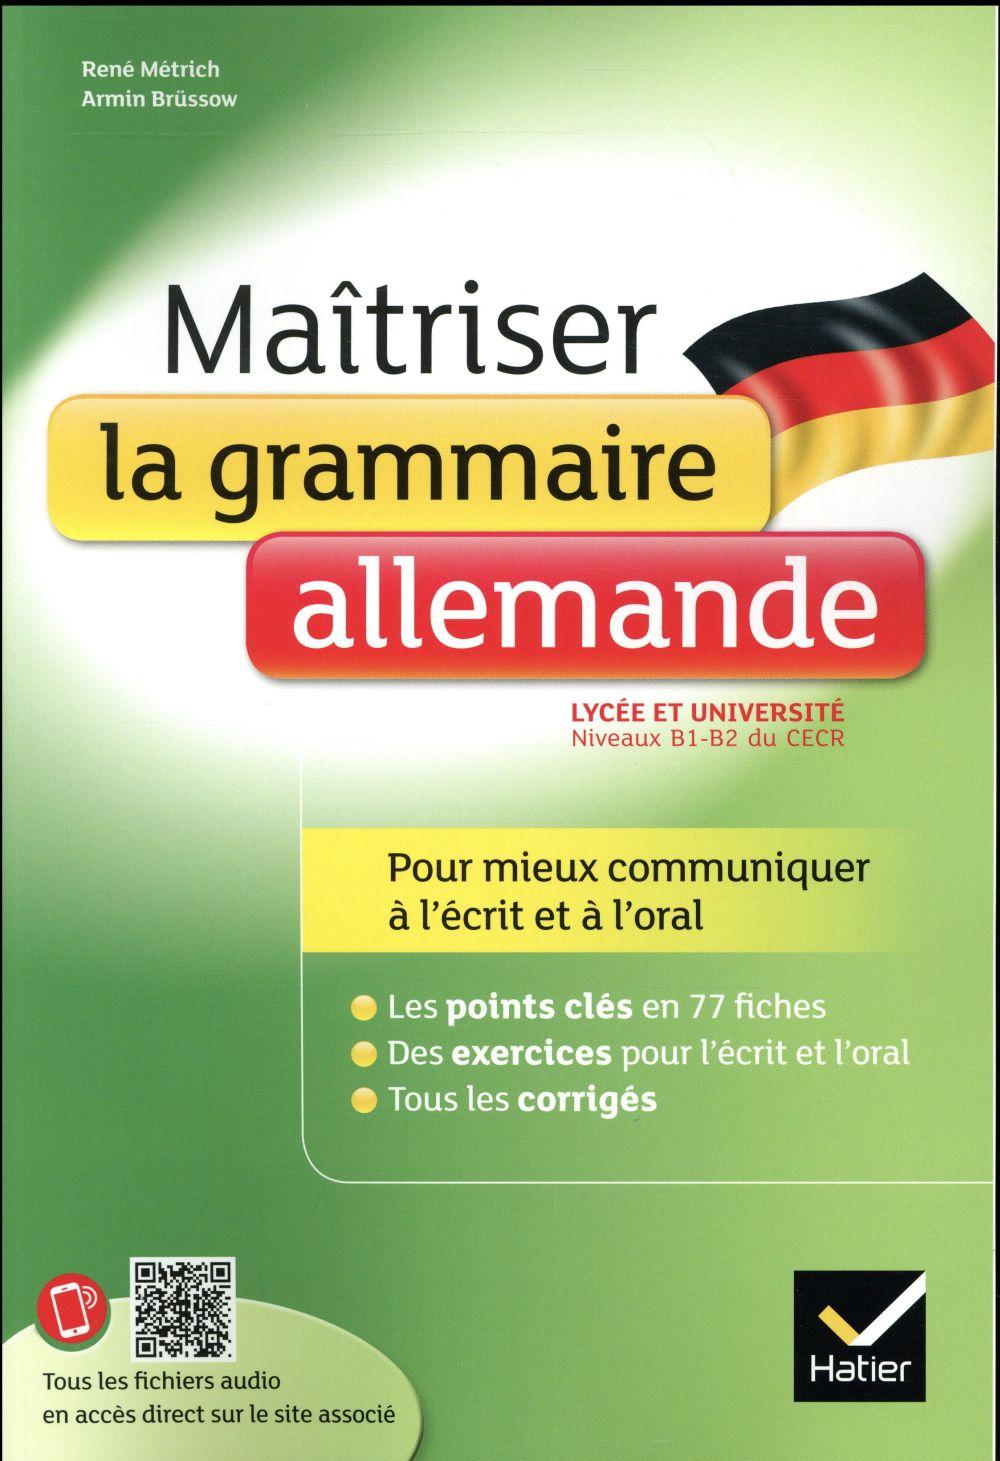 Maîtriser la grammaire allemande